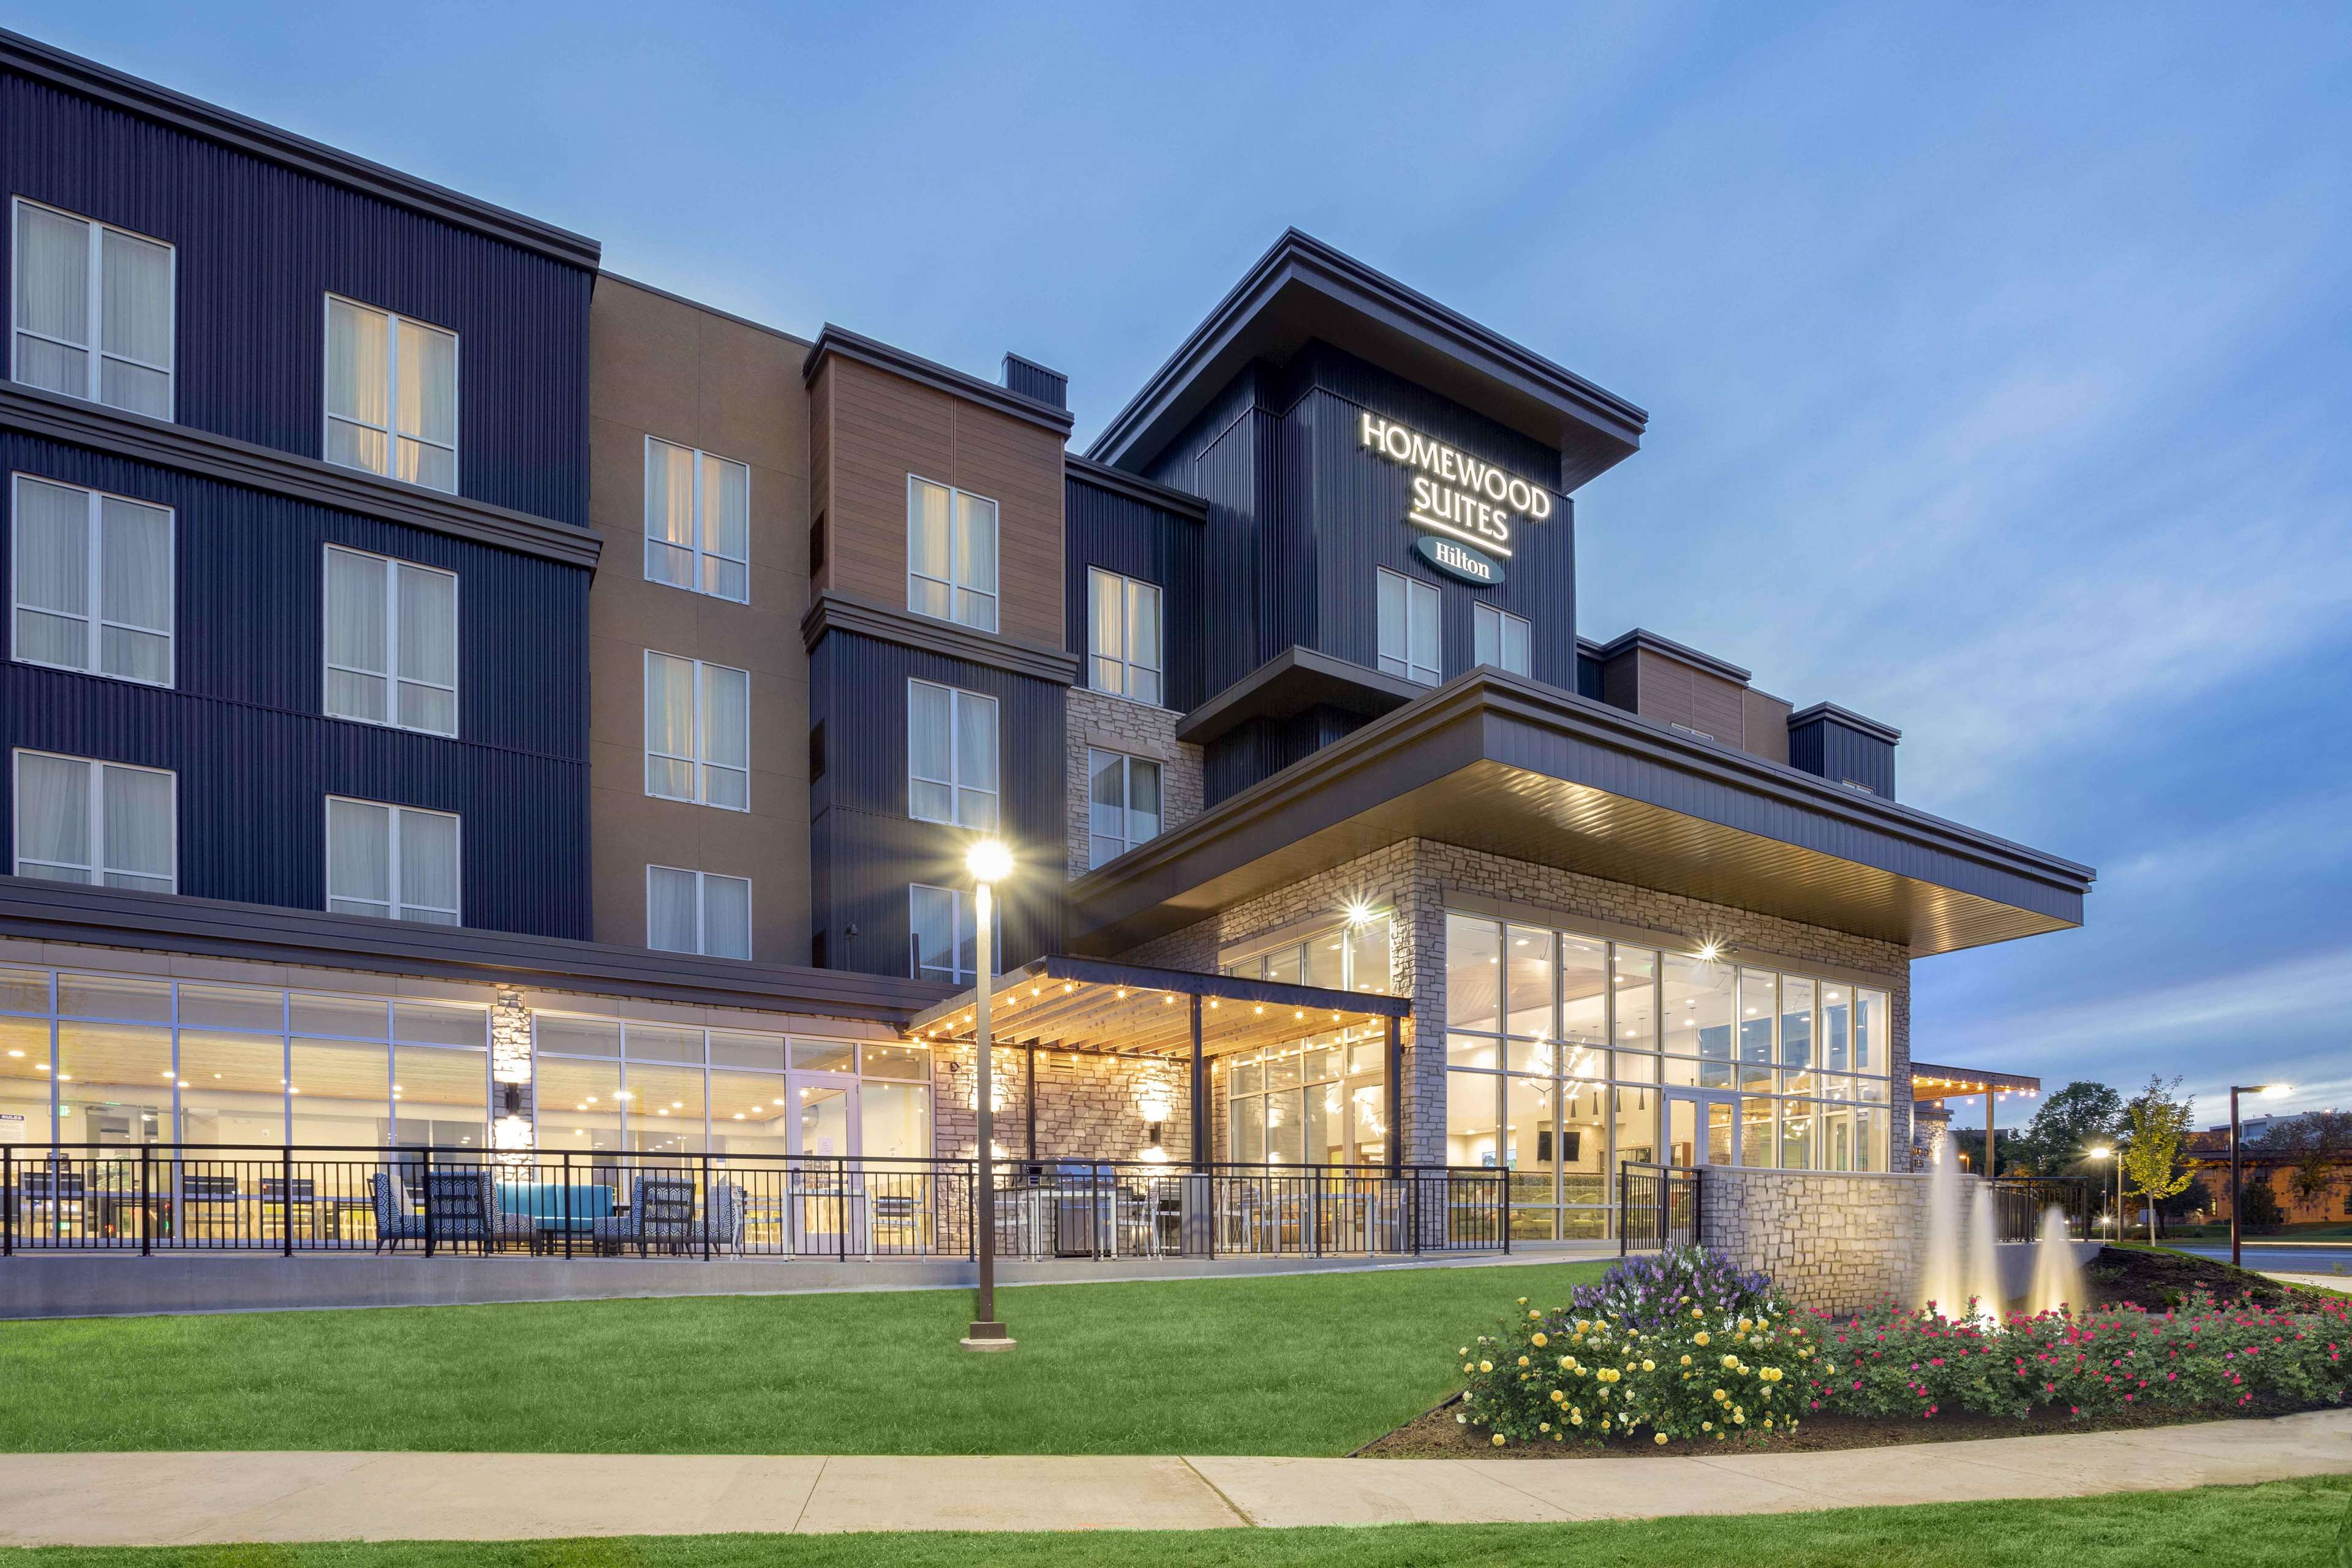 Homewood Suites by Hilton Edina Minneapolis image 3